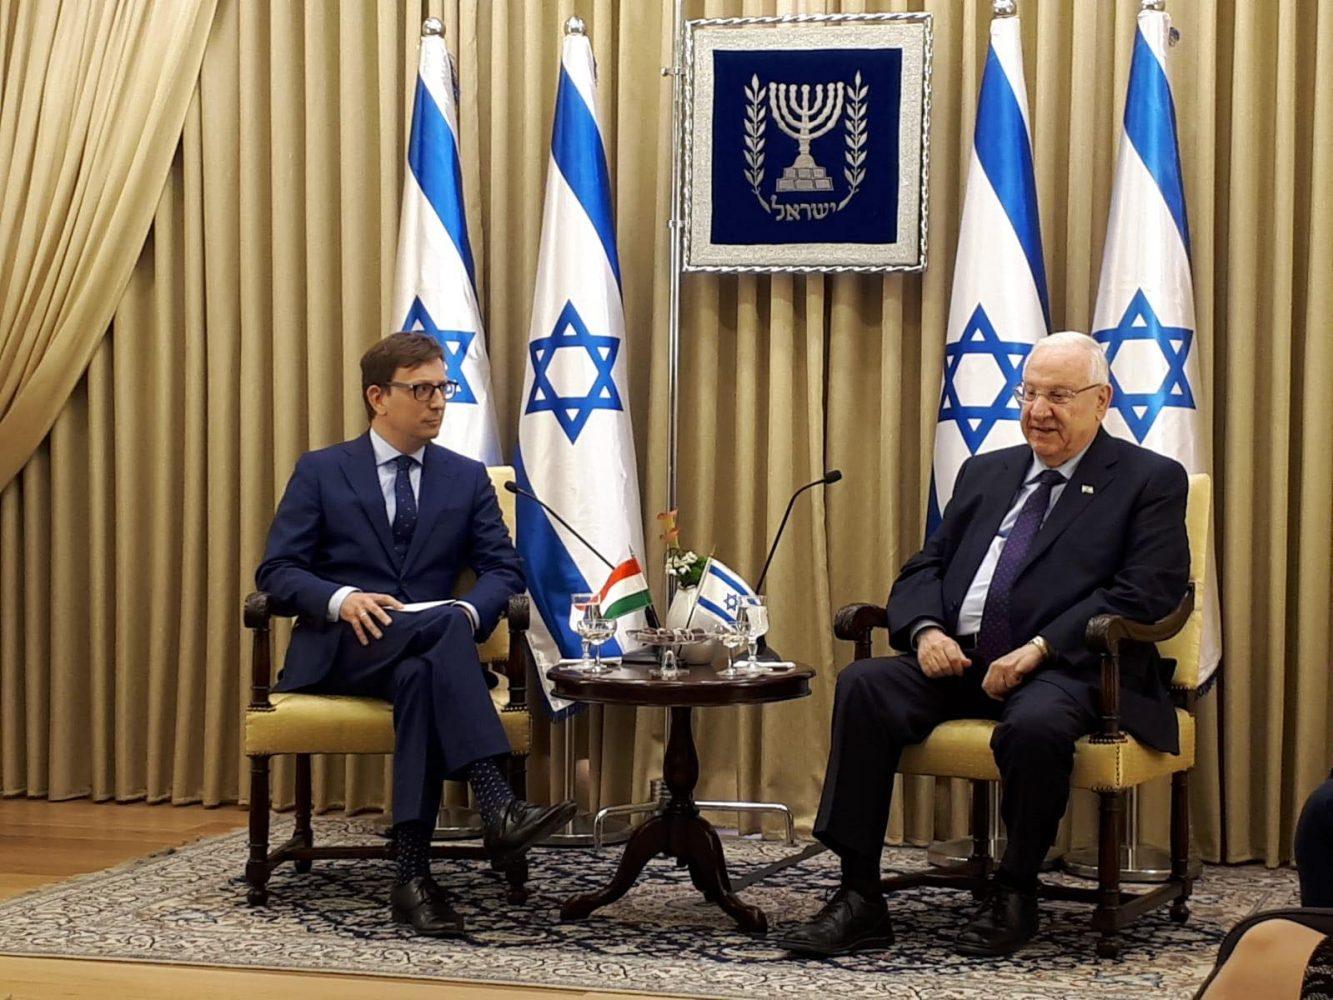 benko levente izraeli magyar nagykovet es reuven livlin1